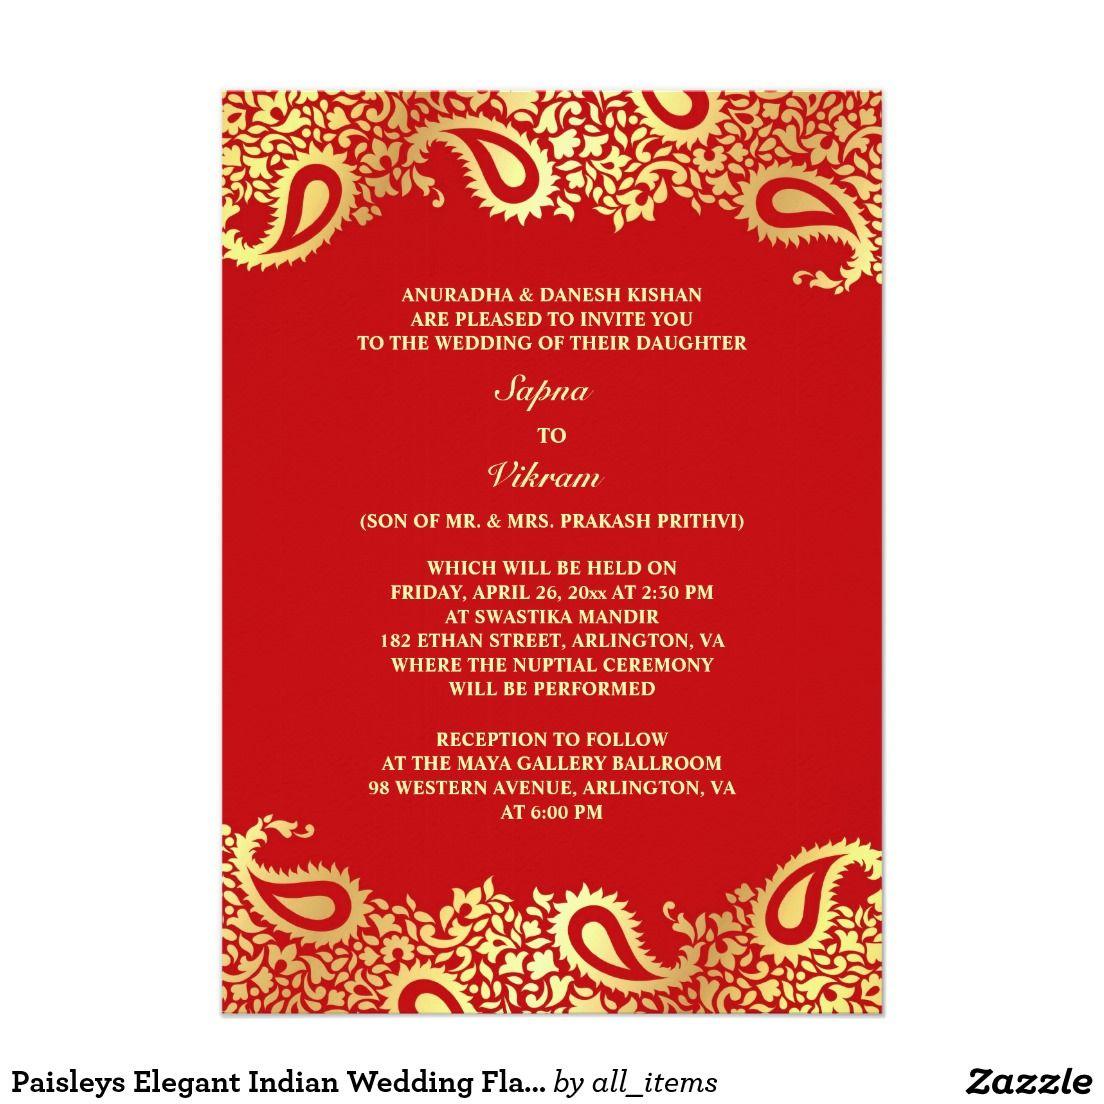 Indian wedding invitation buyretina paisleys elegant indian wedding flat invitation pictures gallery stopboris Choice Image